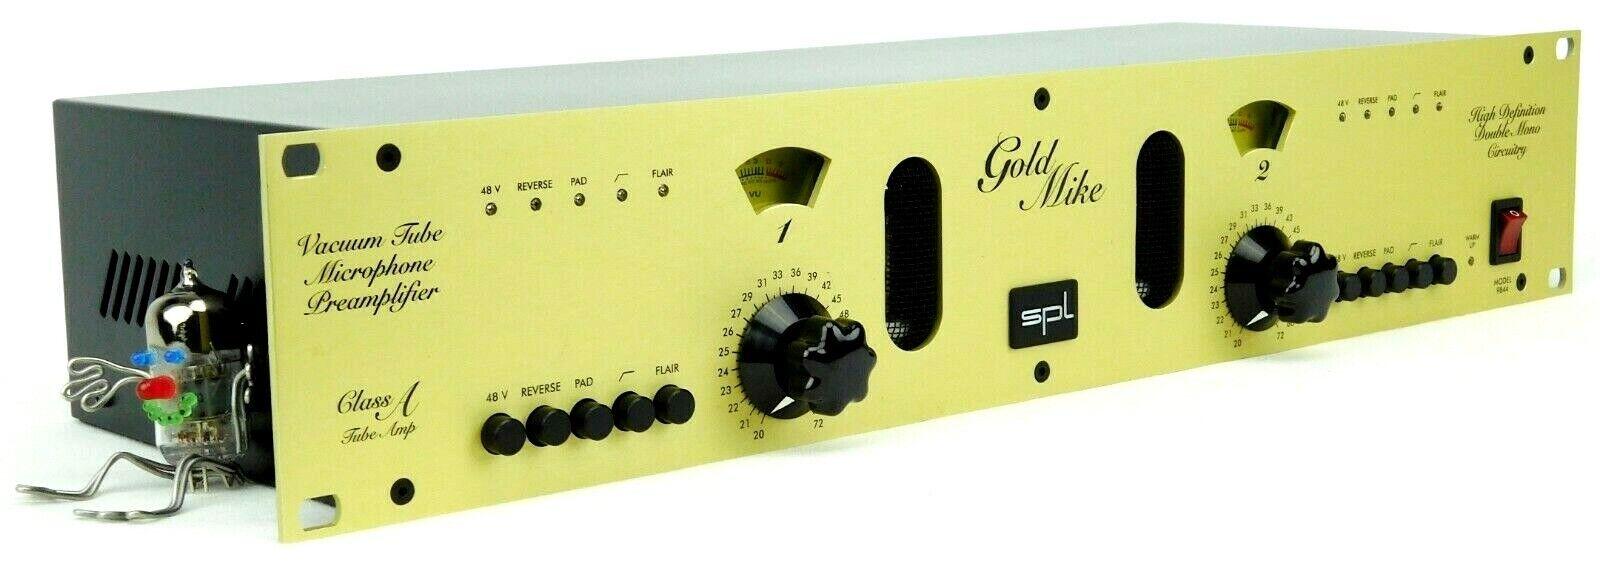 SPL Goldmice 9844 Dual Tube Mic Preamp Class - A Tube OVP MINT 2J Garantie